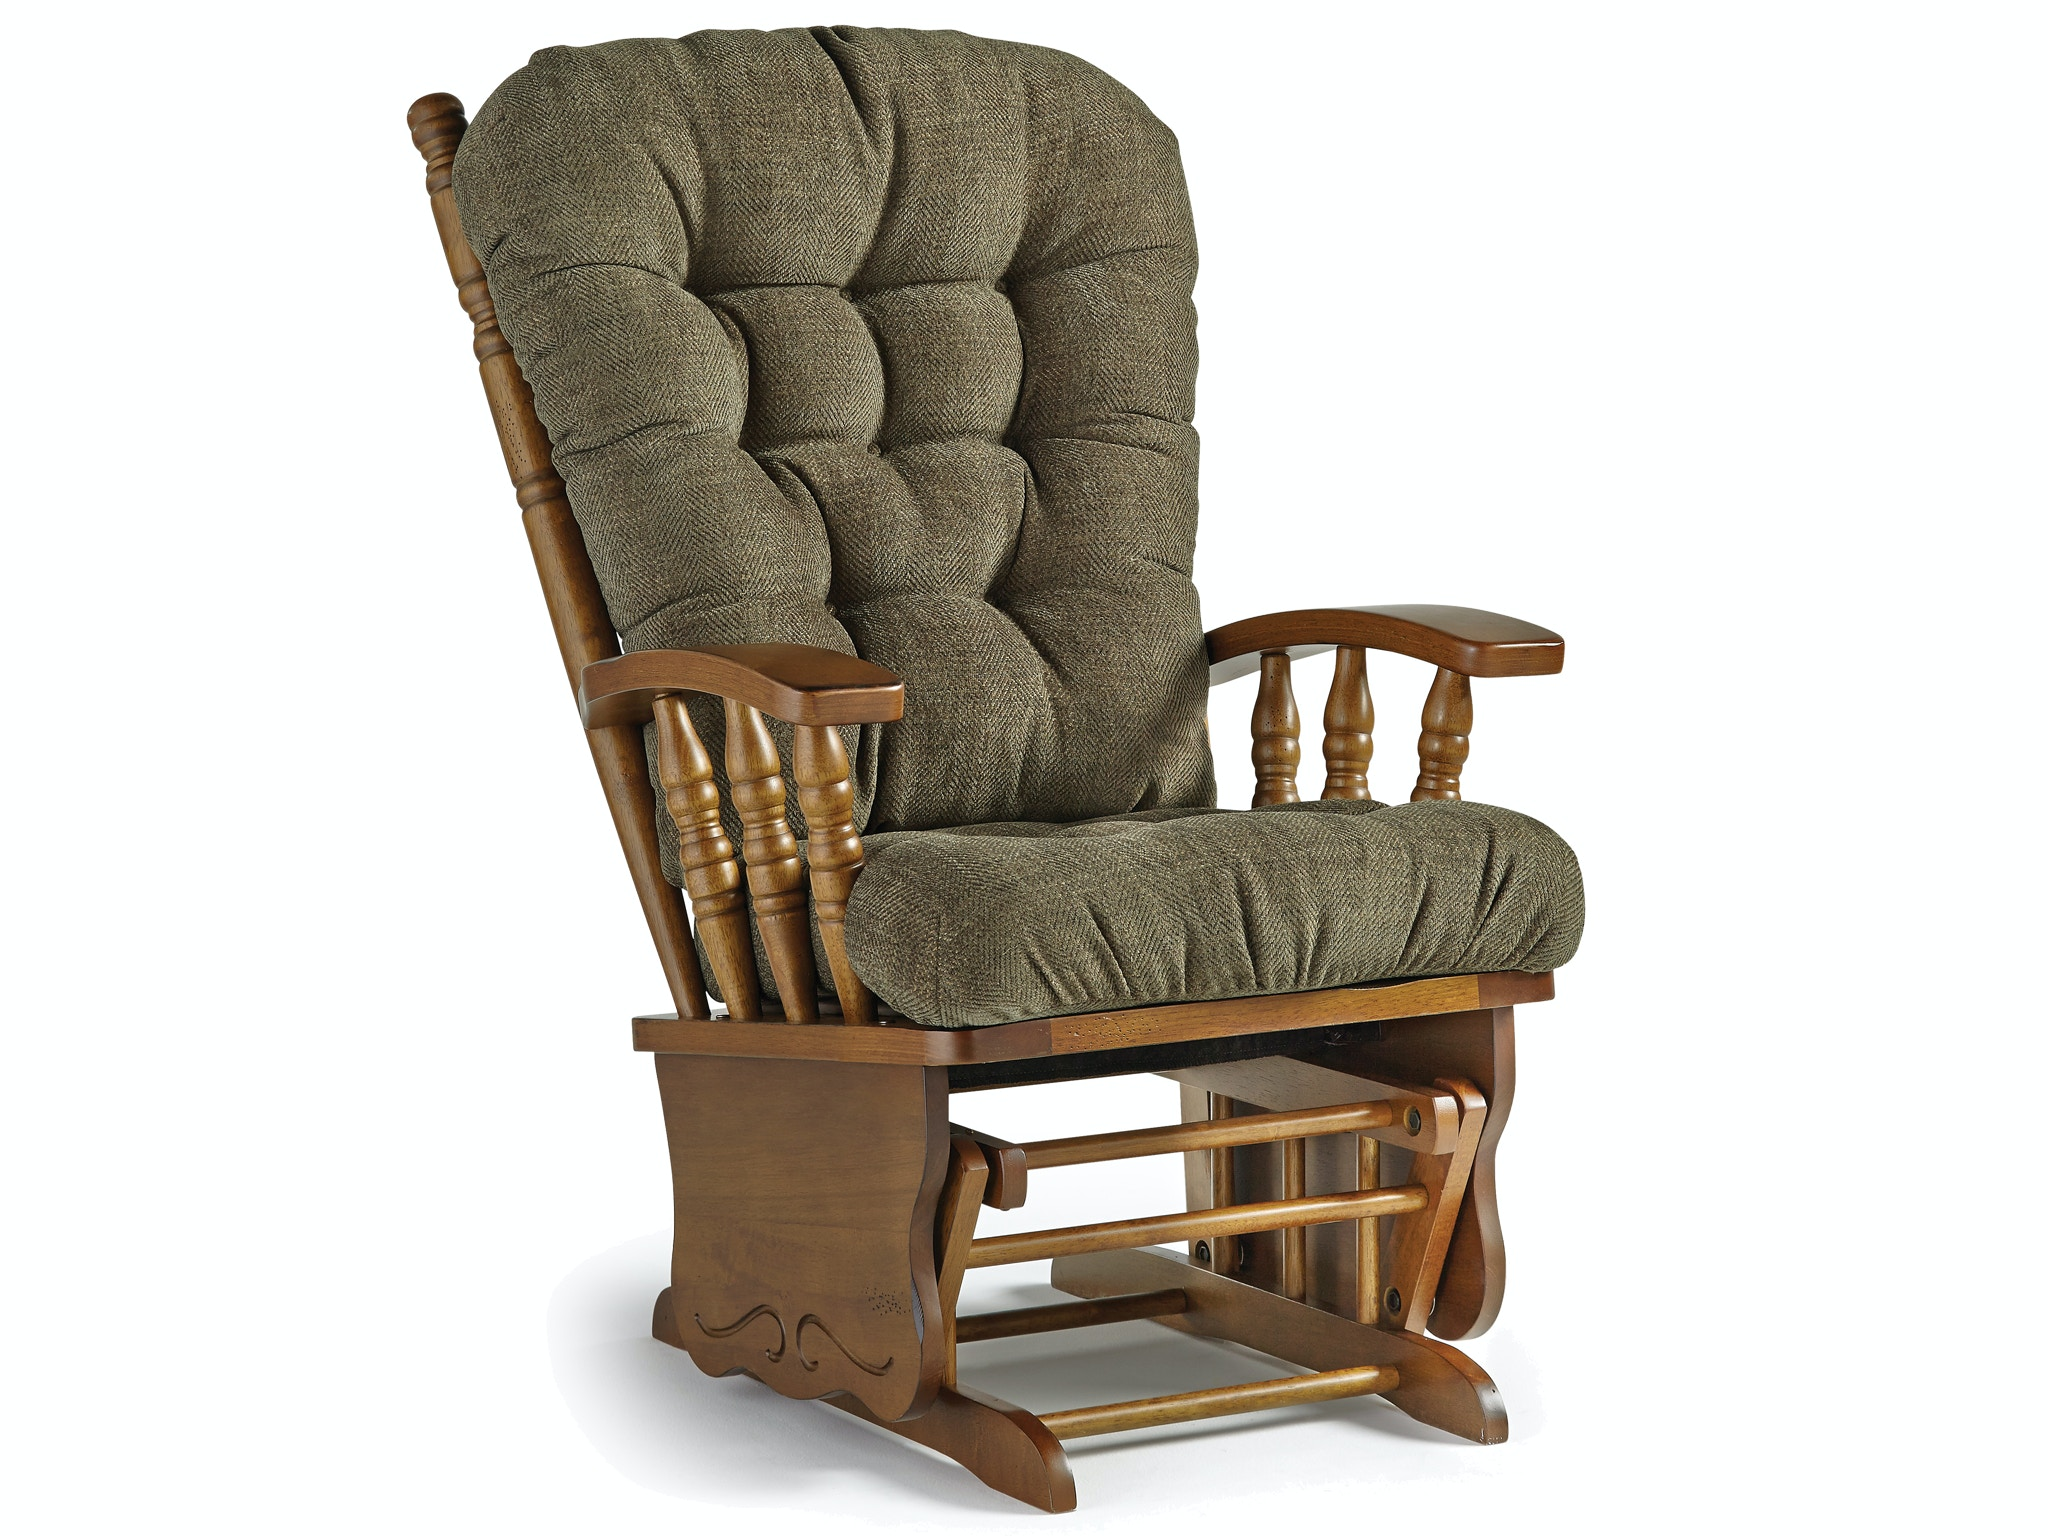 best chairs geneva glider weight limit childrens panton chair home furnishings living room glide rocker c5867